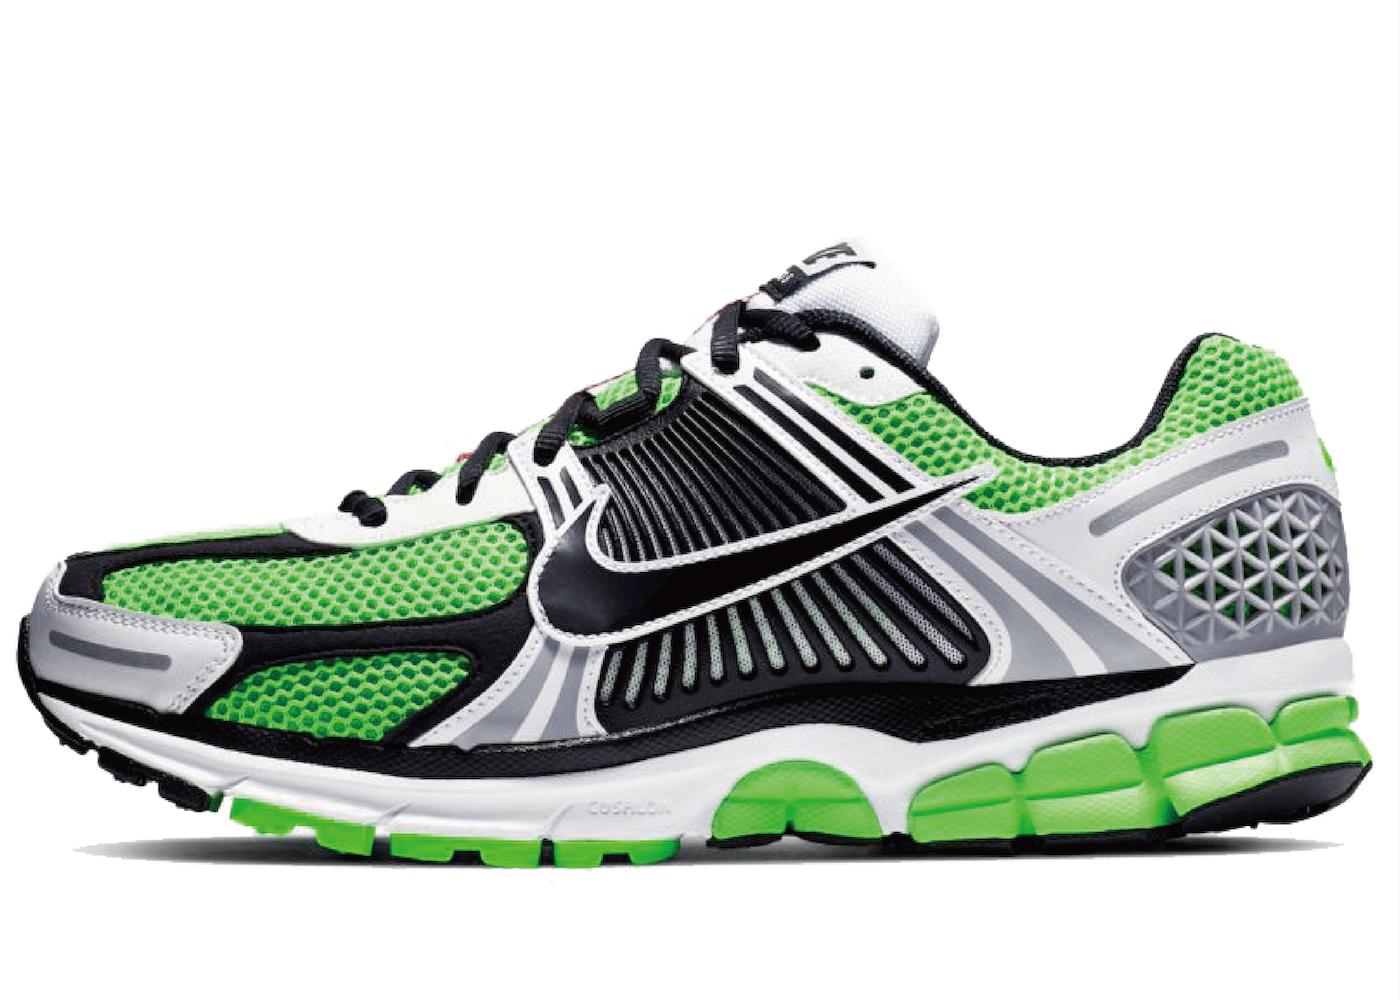 Nike Zoom Vomero 5 Lime Greenの写真